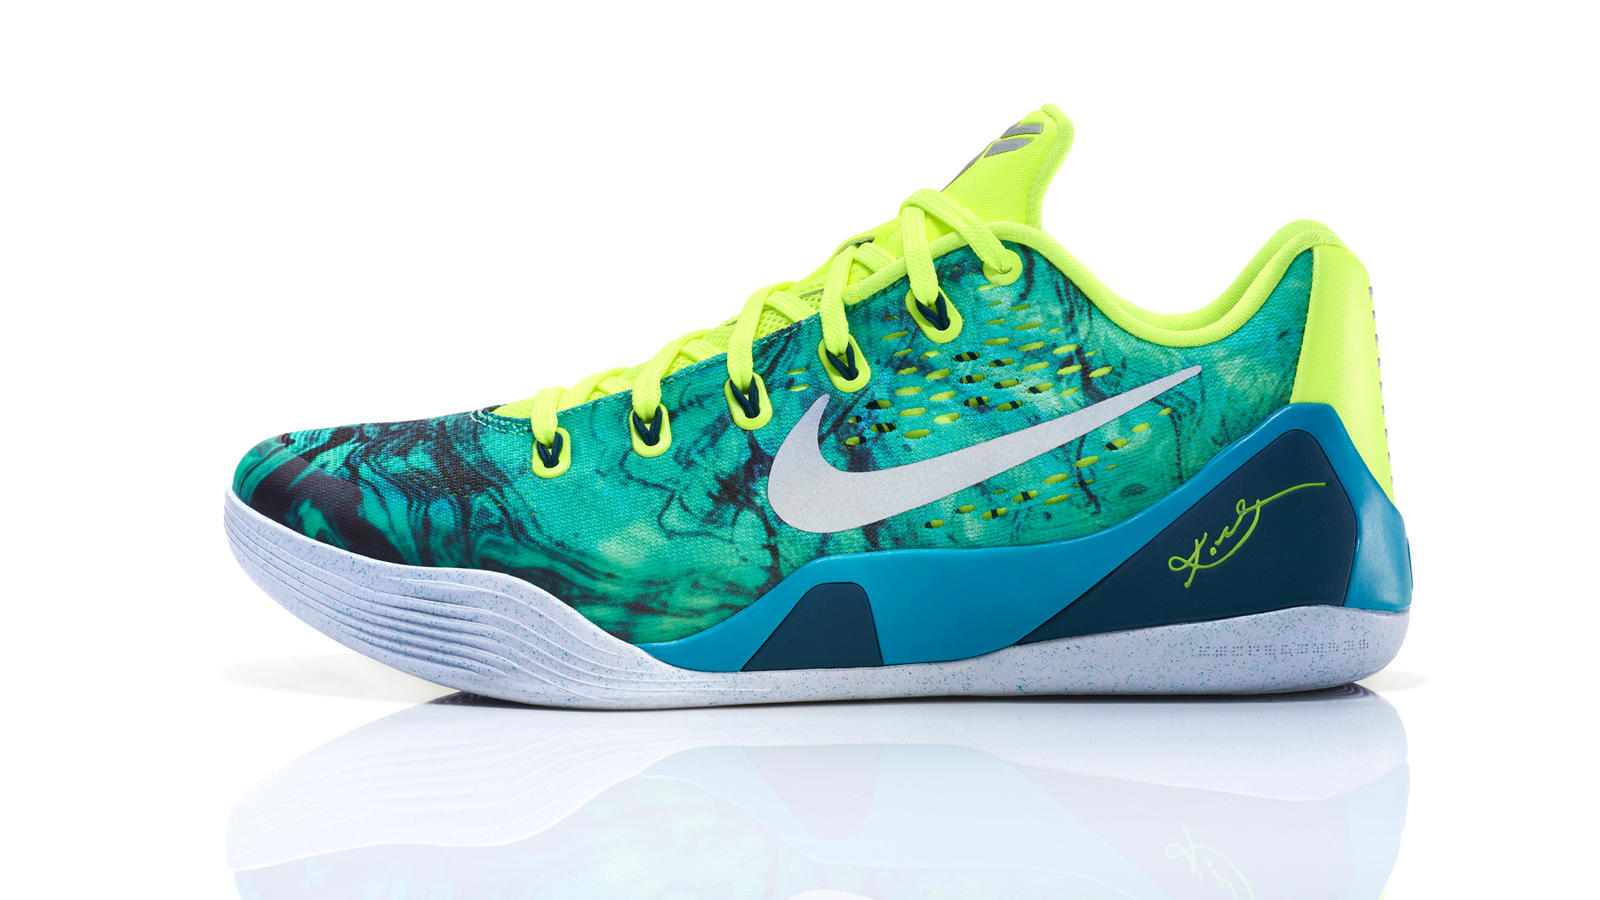 2014 Nike Basketball Easter Collection